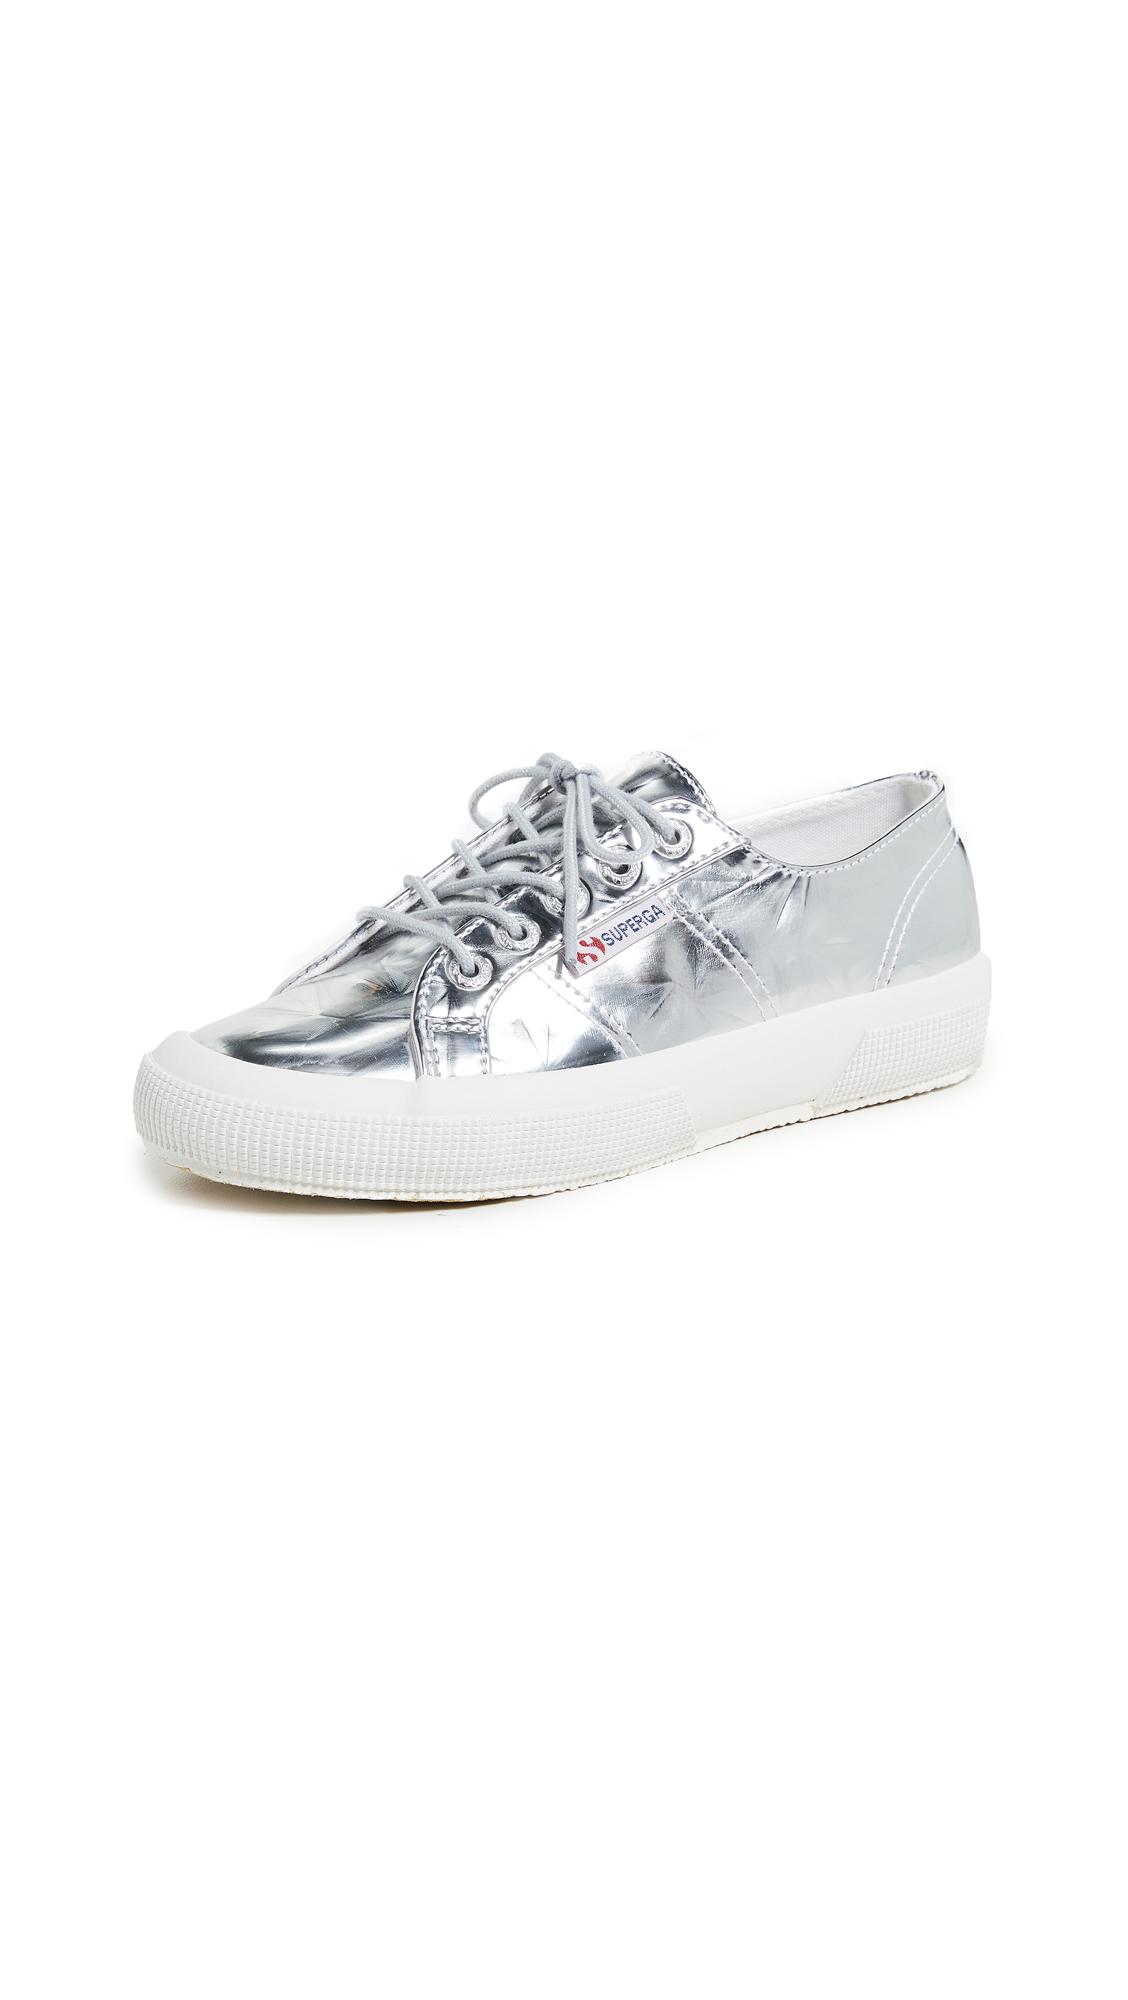 Superga 2750 Metallic Sneakers - Silver